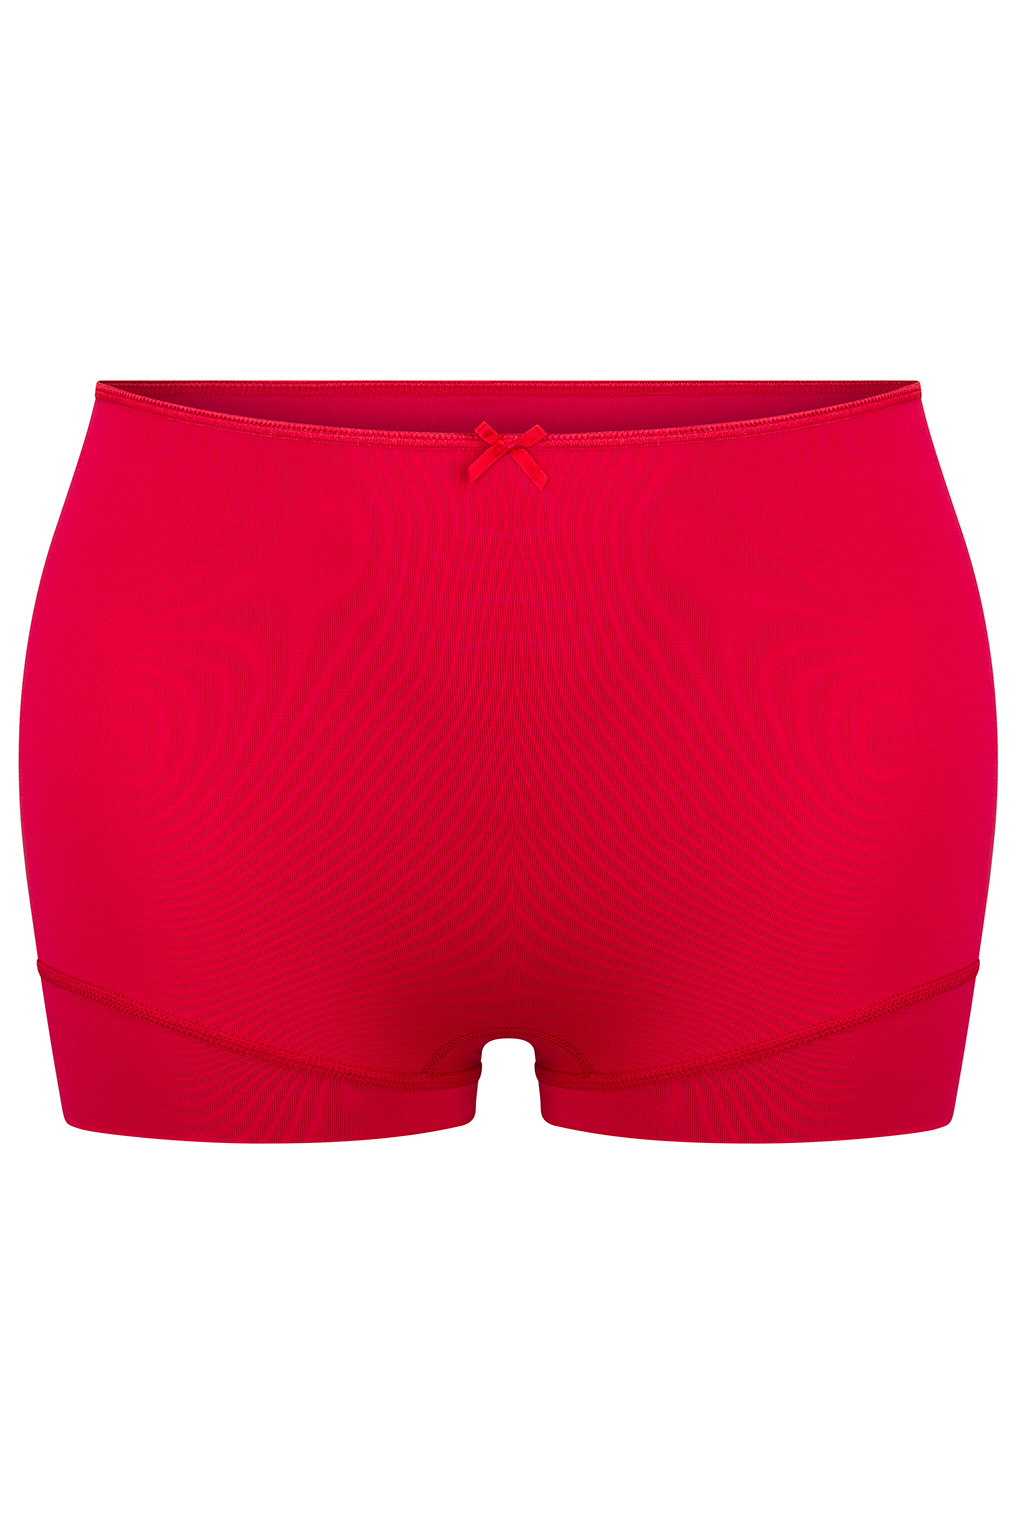 RJ Pure Color Dames Short Extra Hoog